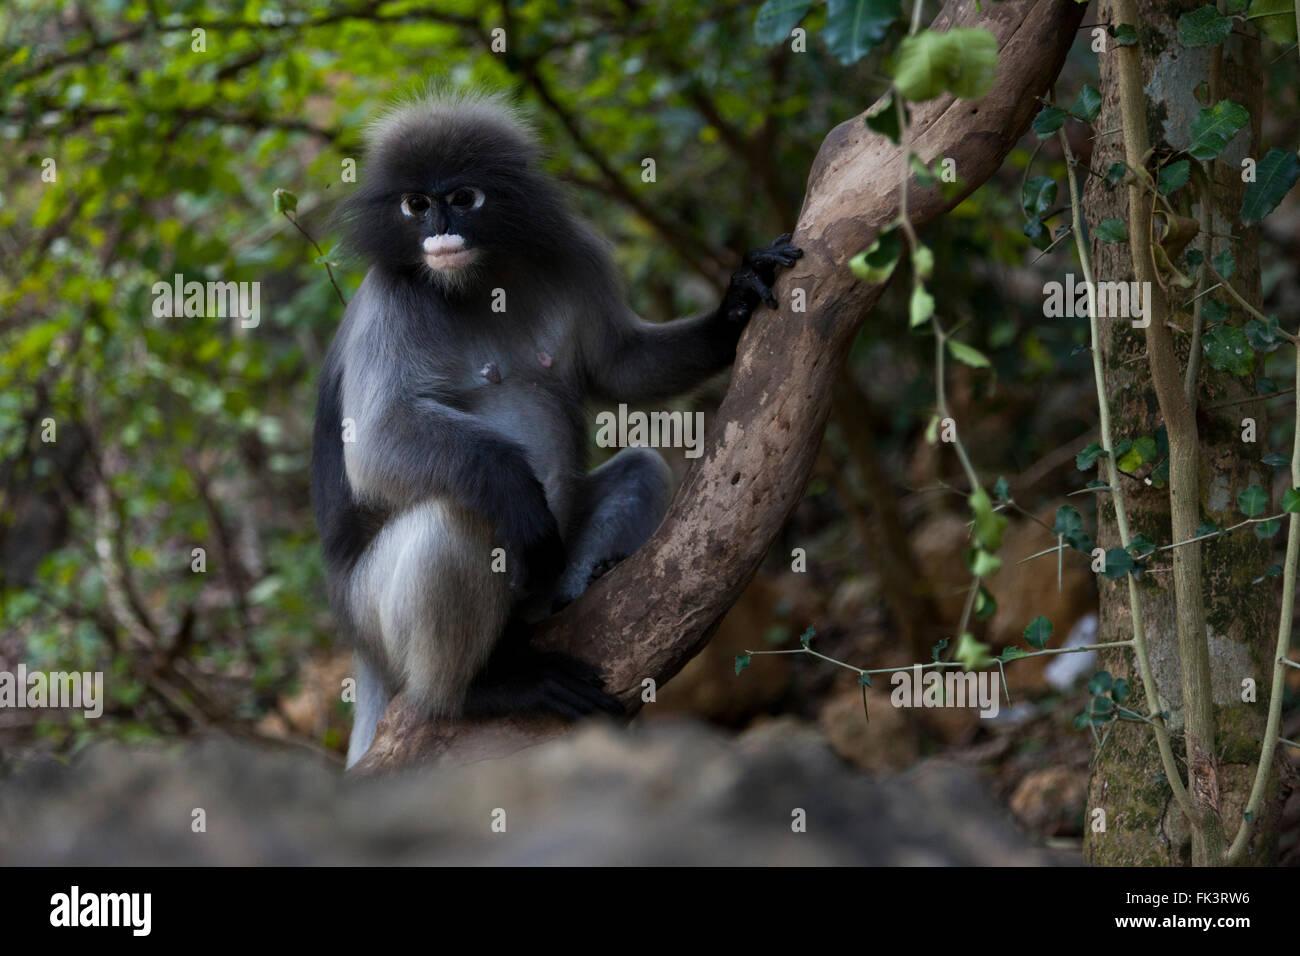 Langur monkey (Trachypithecus obscurus), in the historical Park of Khao Lommuak (Prachuap Khiri Khan - Thailand). - Stock Image